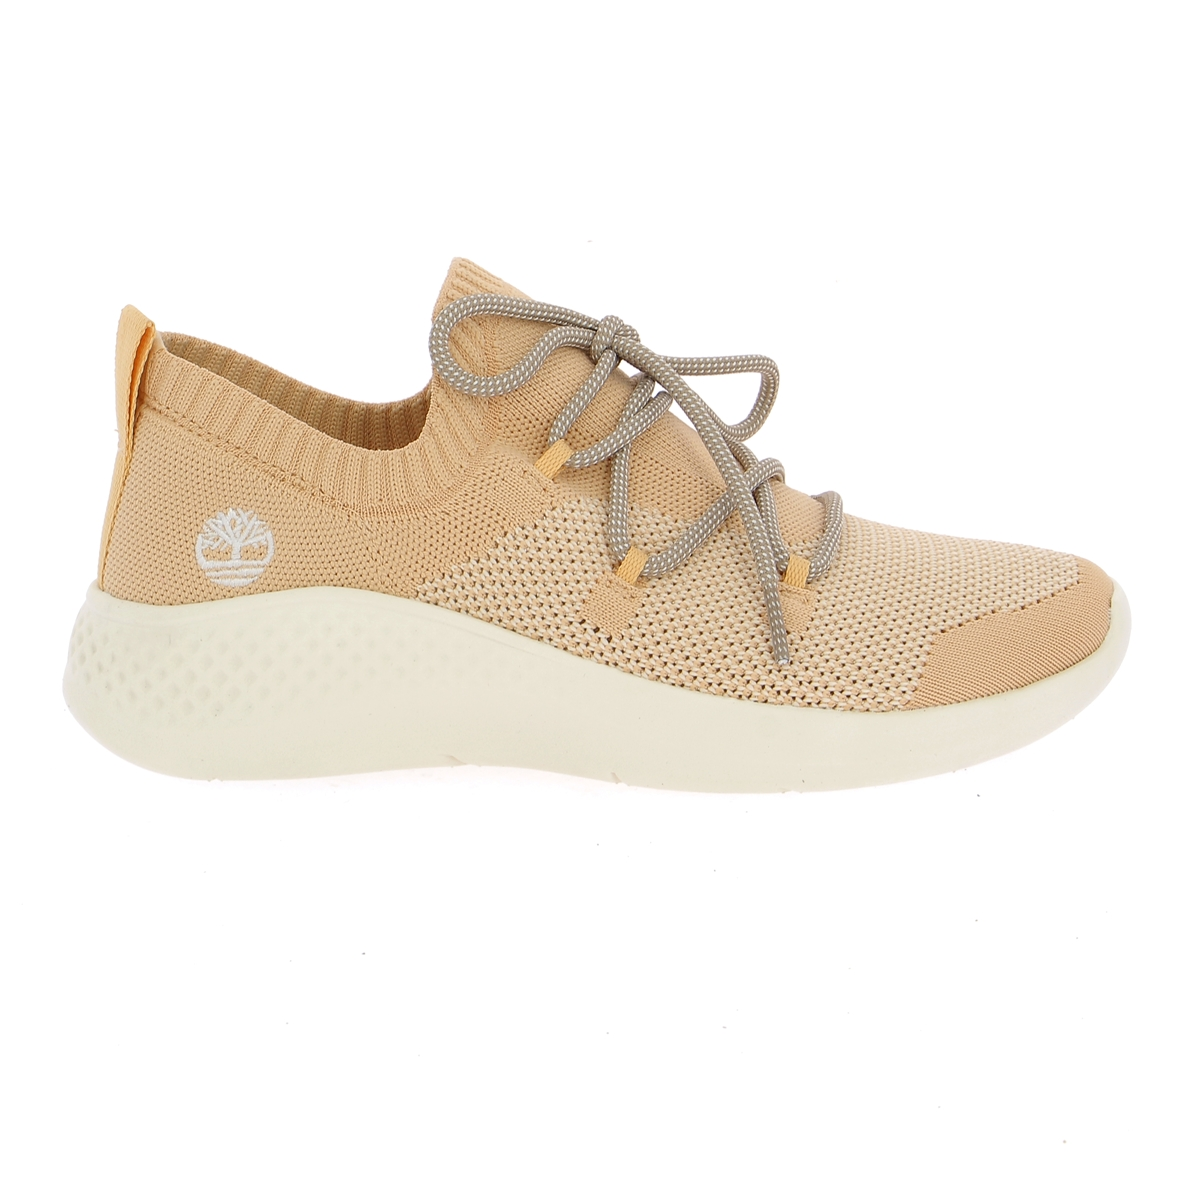 Timberland Sneakers zalm